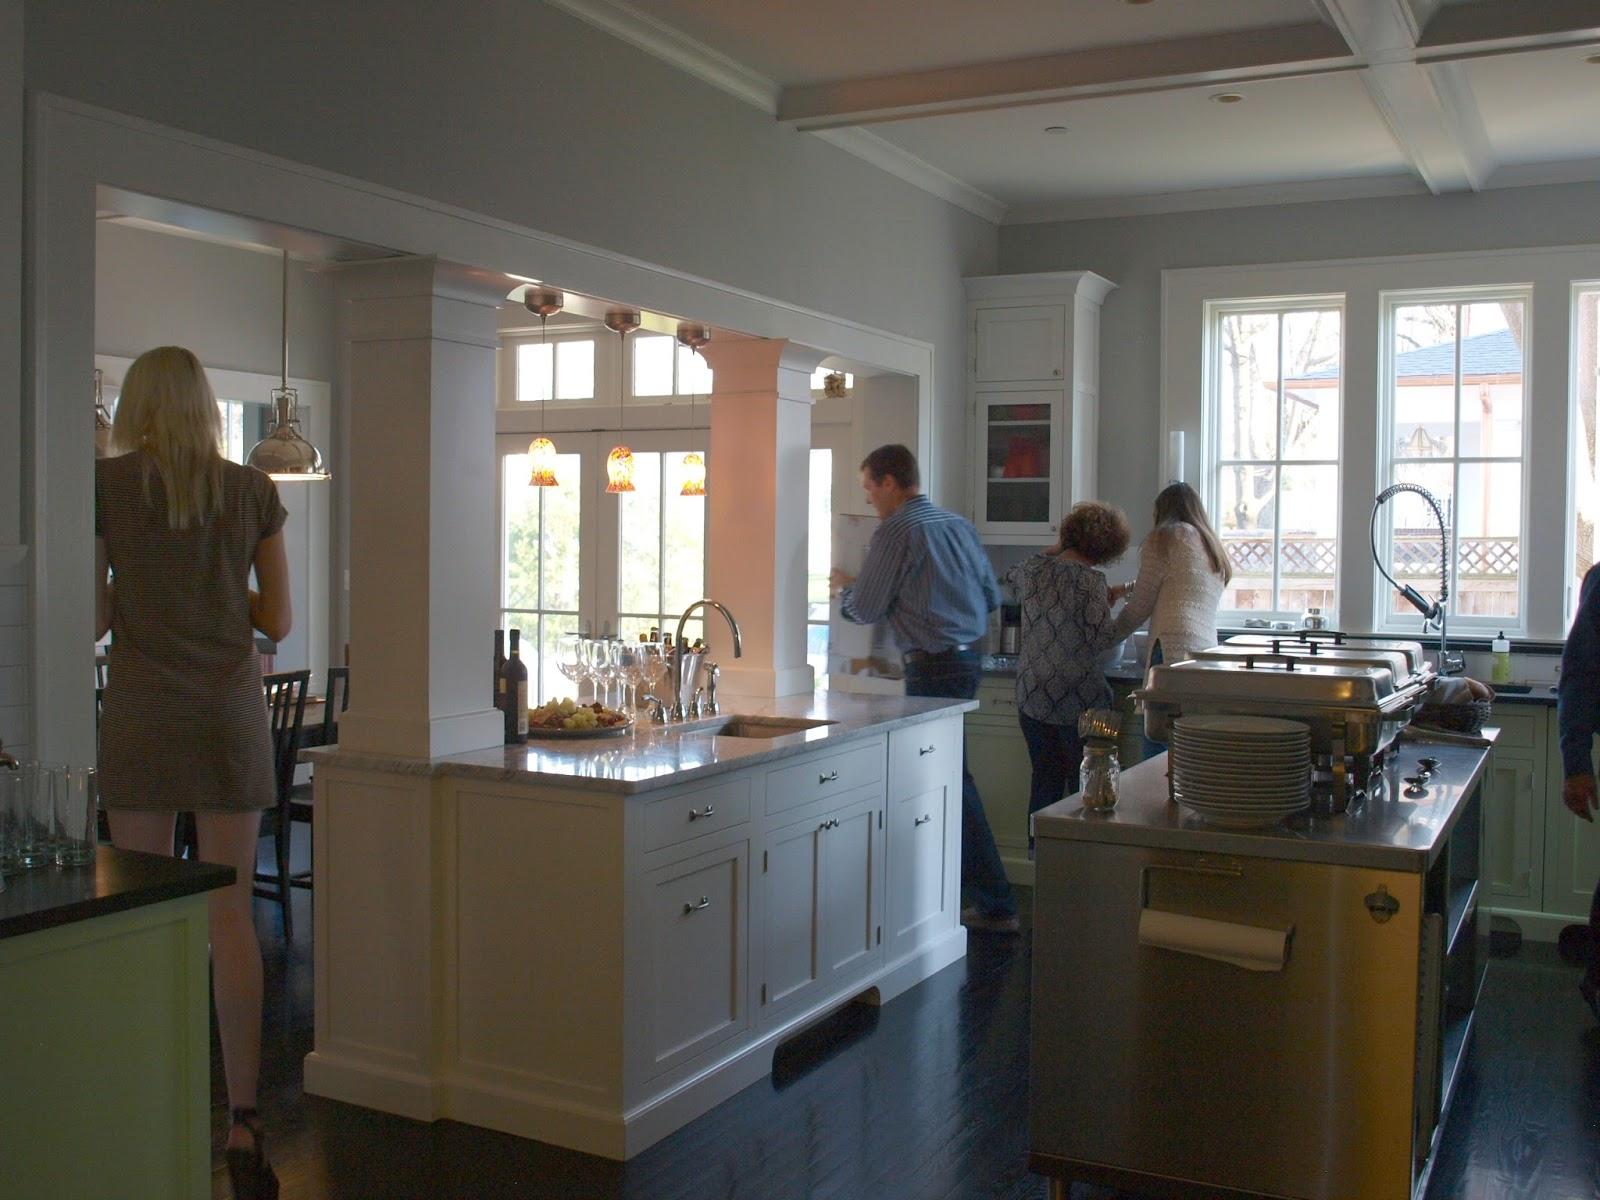 industrial kitchen island cabinets door handles farmhouse home decor {my birthday party ...